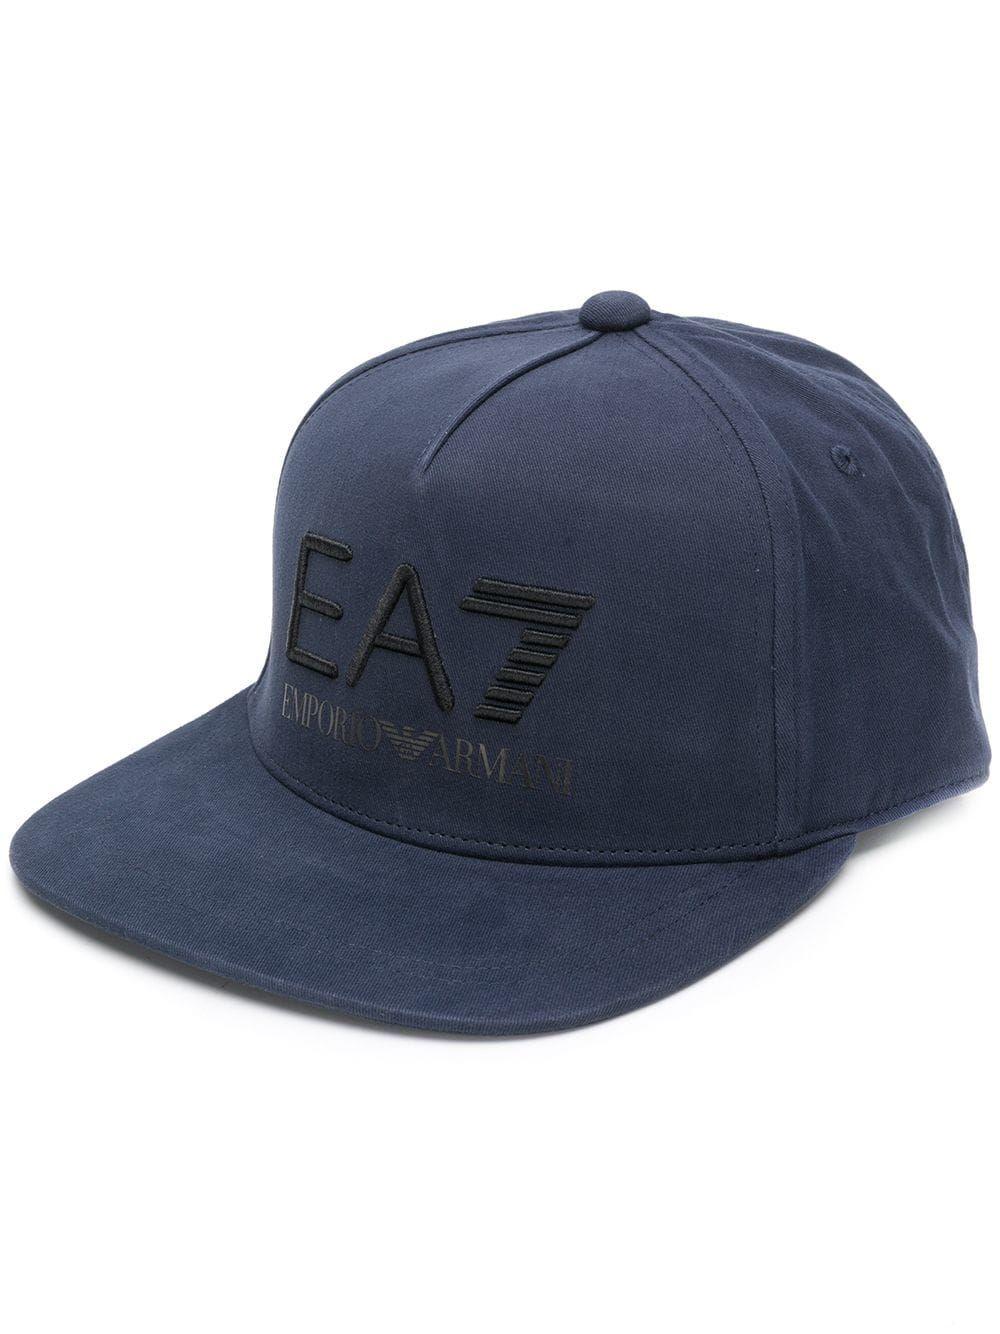 955488e1b0 EA7 EMPORIO ARMANI EA7 EMPORIO ARMANI EMBROIDERED LOGO CAP - BLUE ...